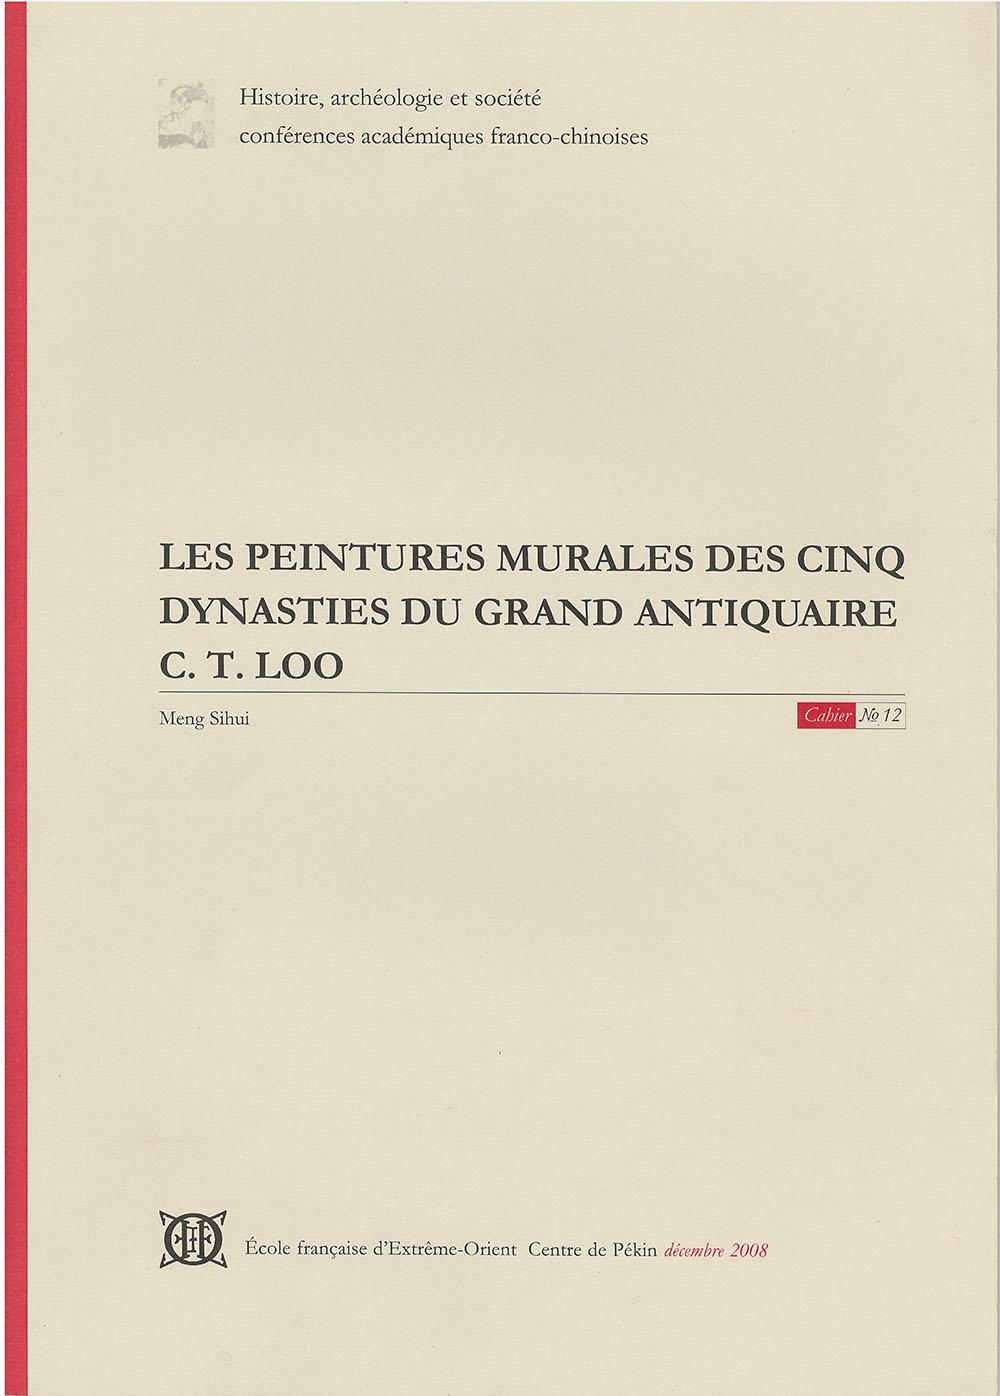 Les Peintures Murales des cinq dynasties du grand antiquaire C. T. Loo